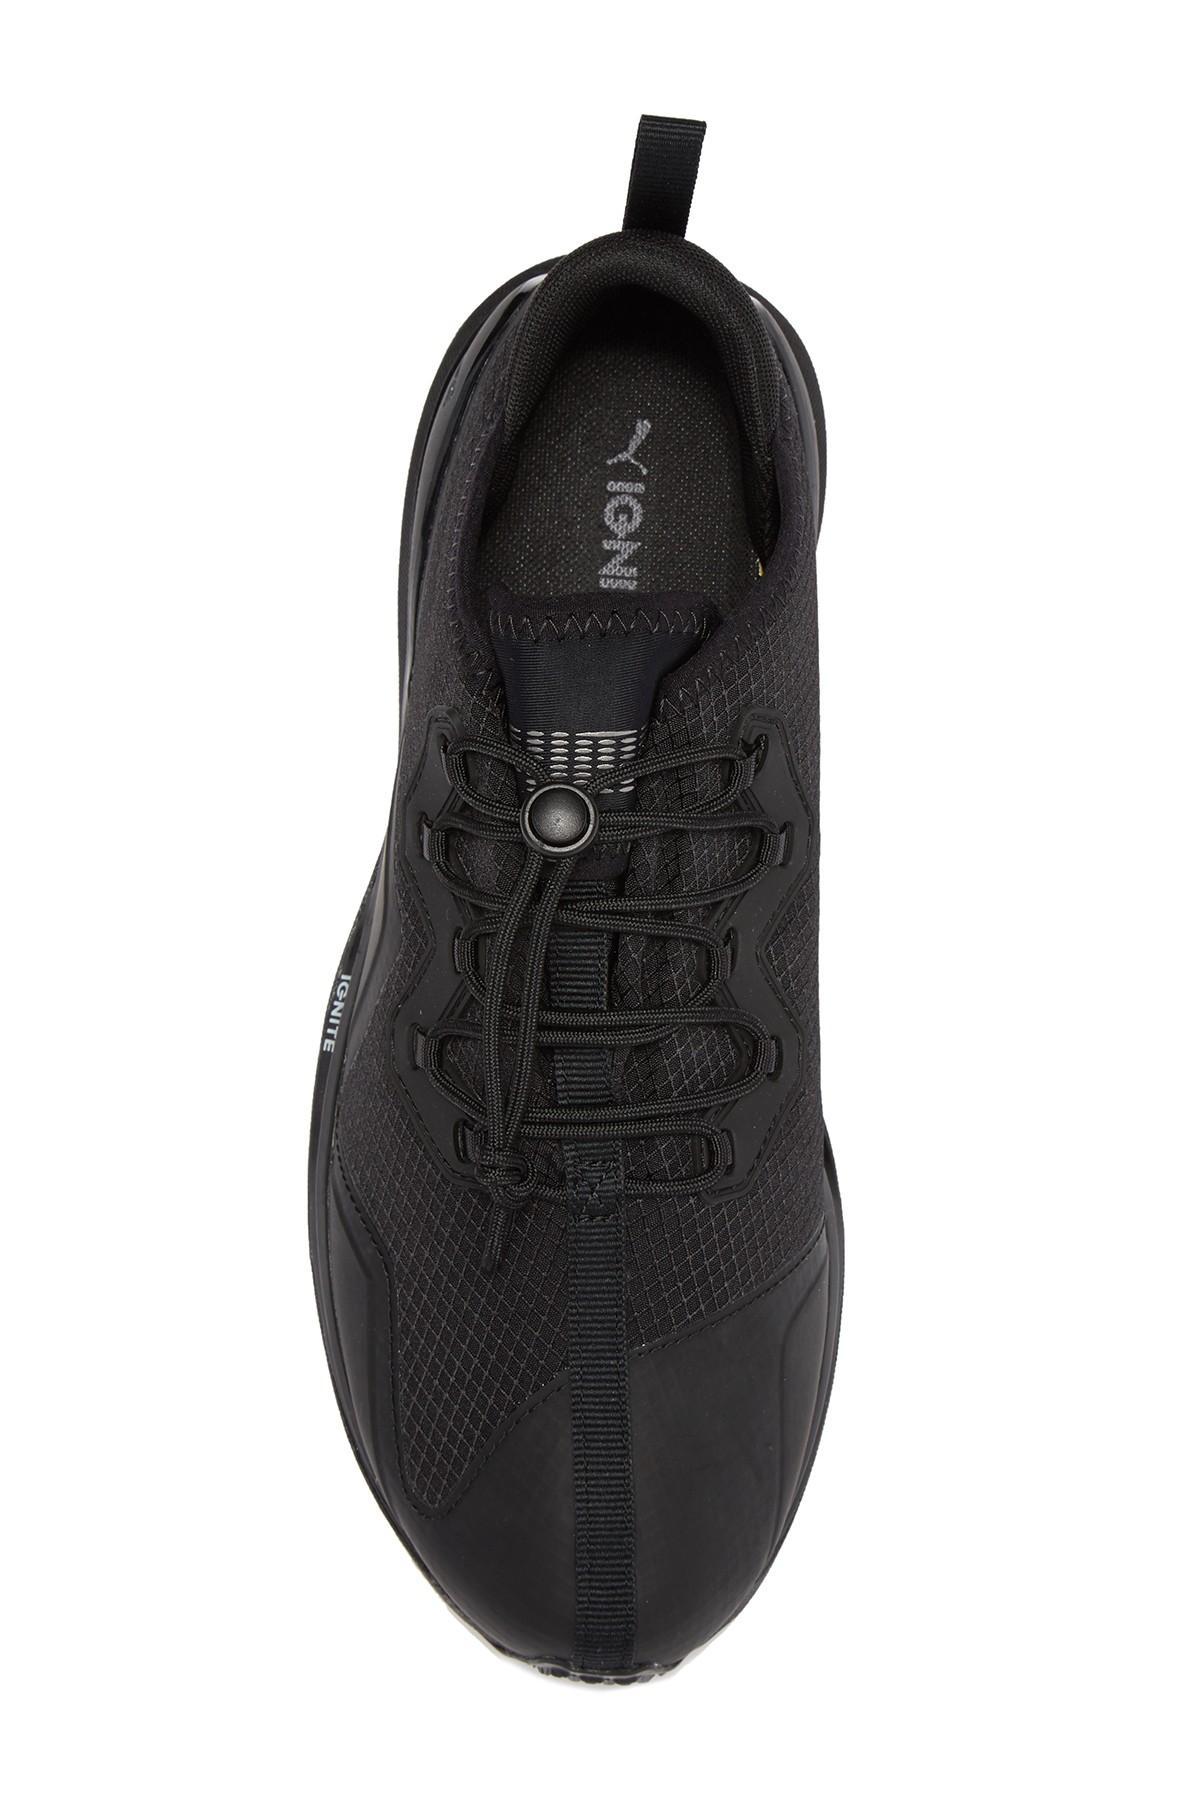 online store 72524 8c1ba Men's Black Ignite Limitless Initiate Athletic Sneaker